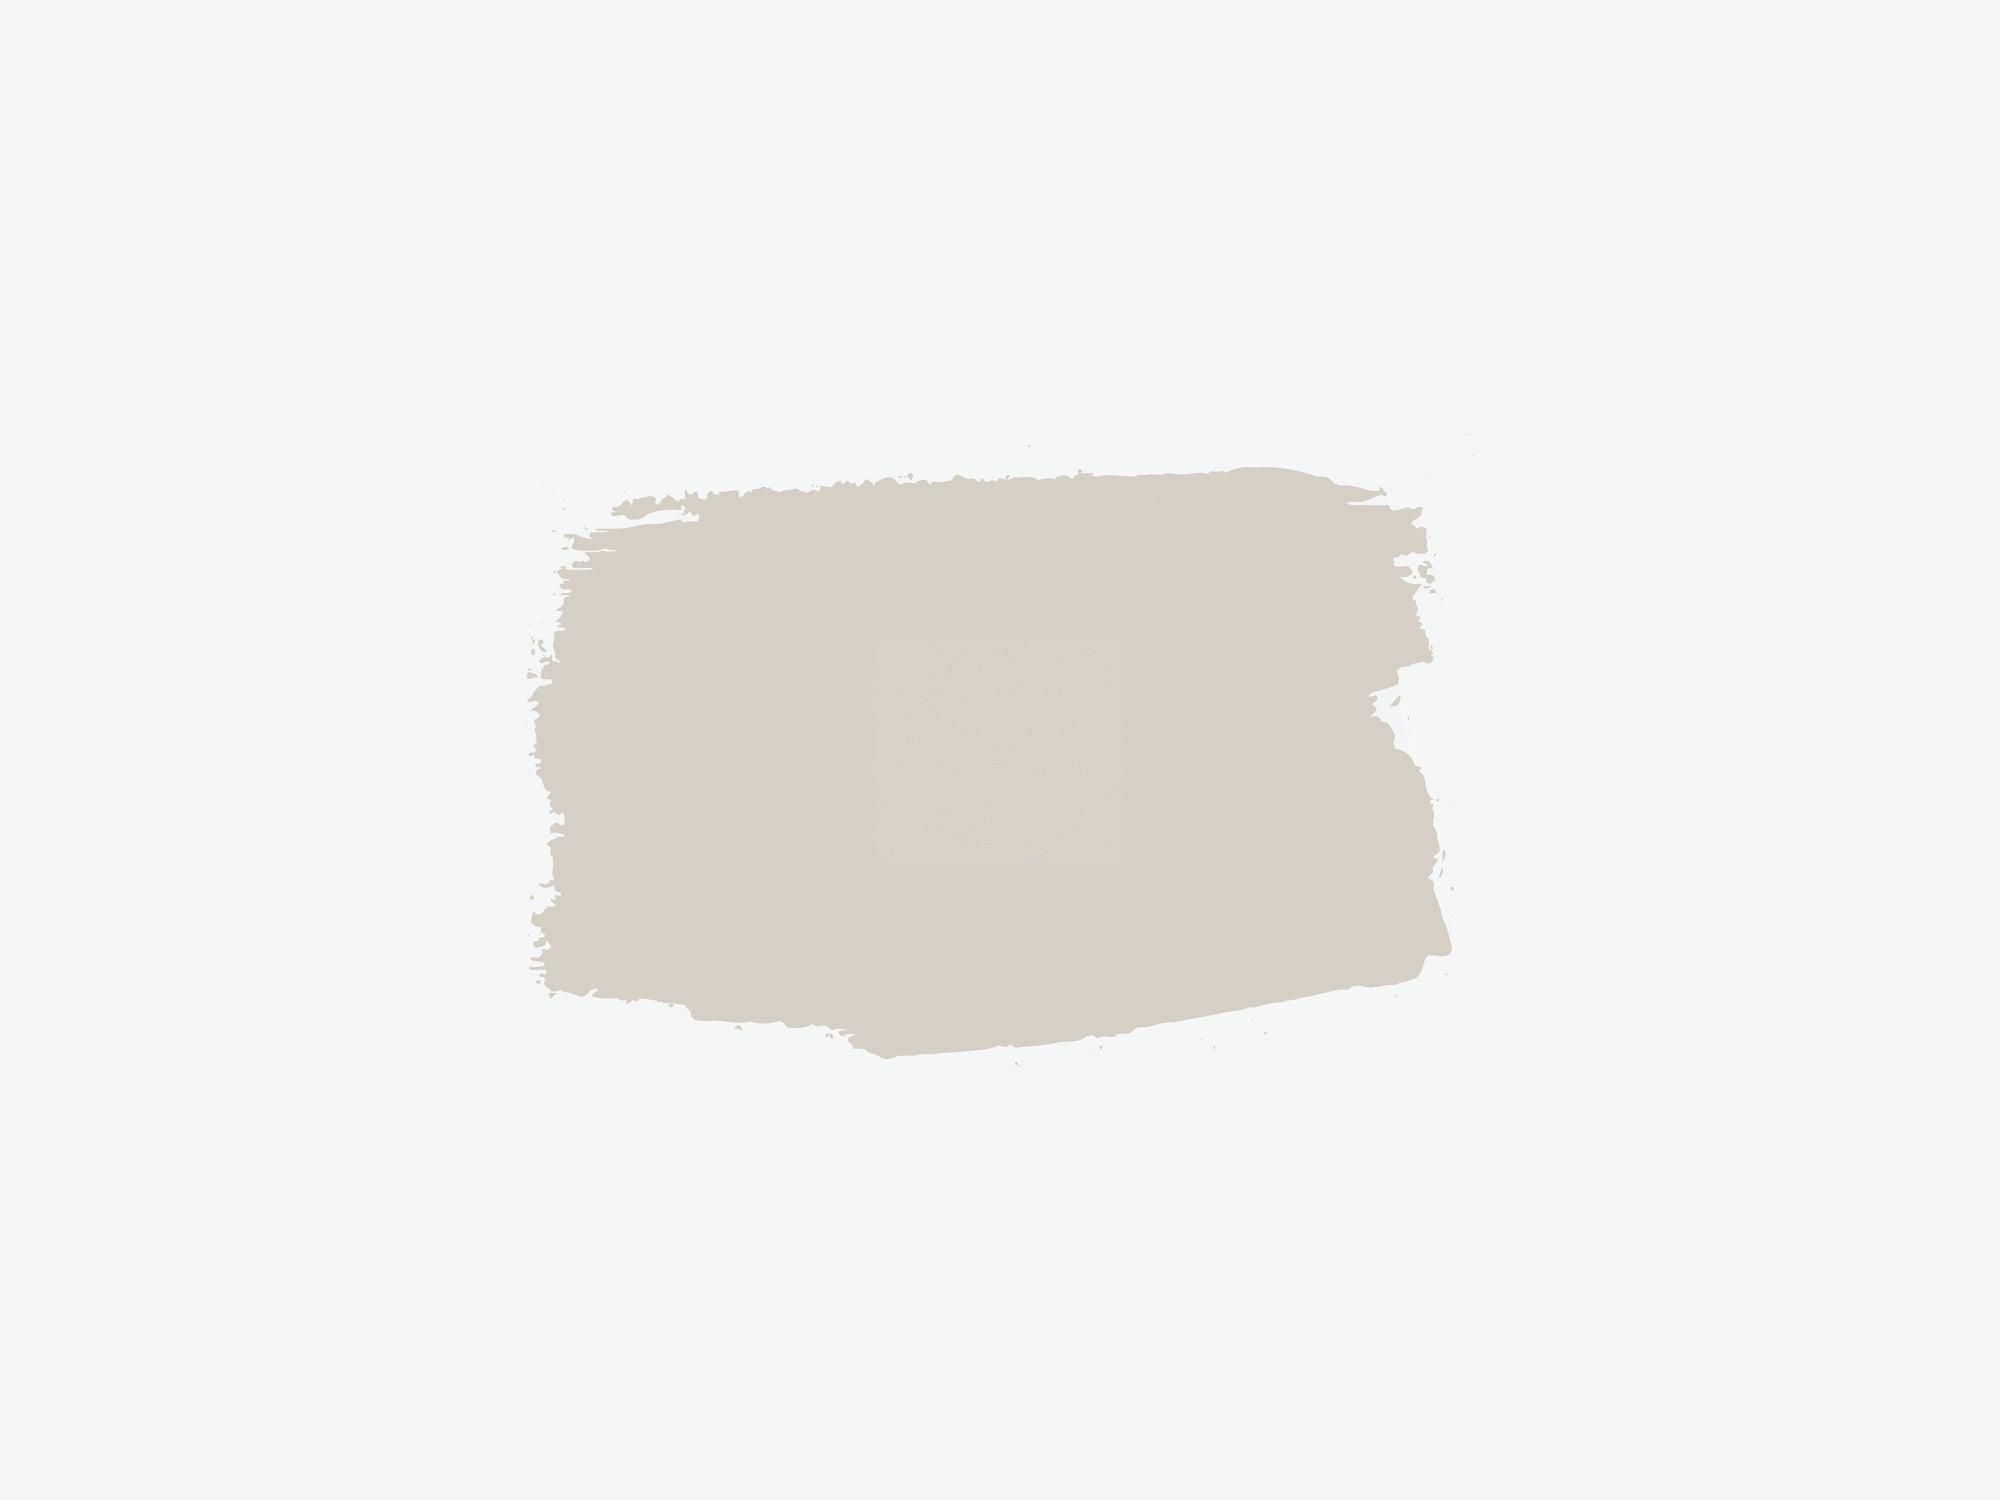 Paintswatch_Silvery Neutral